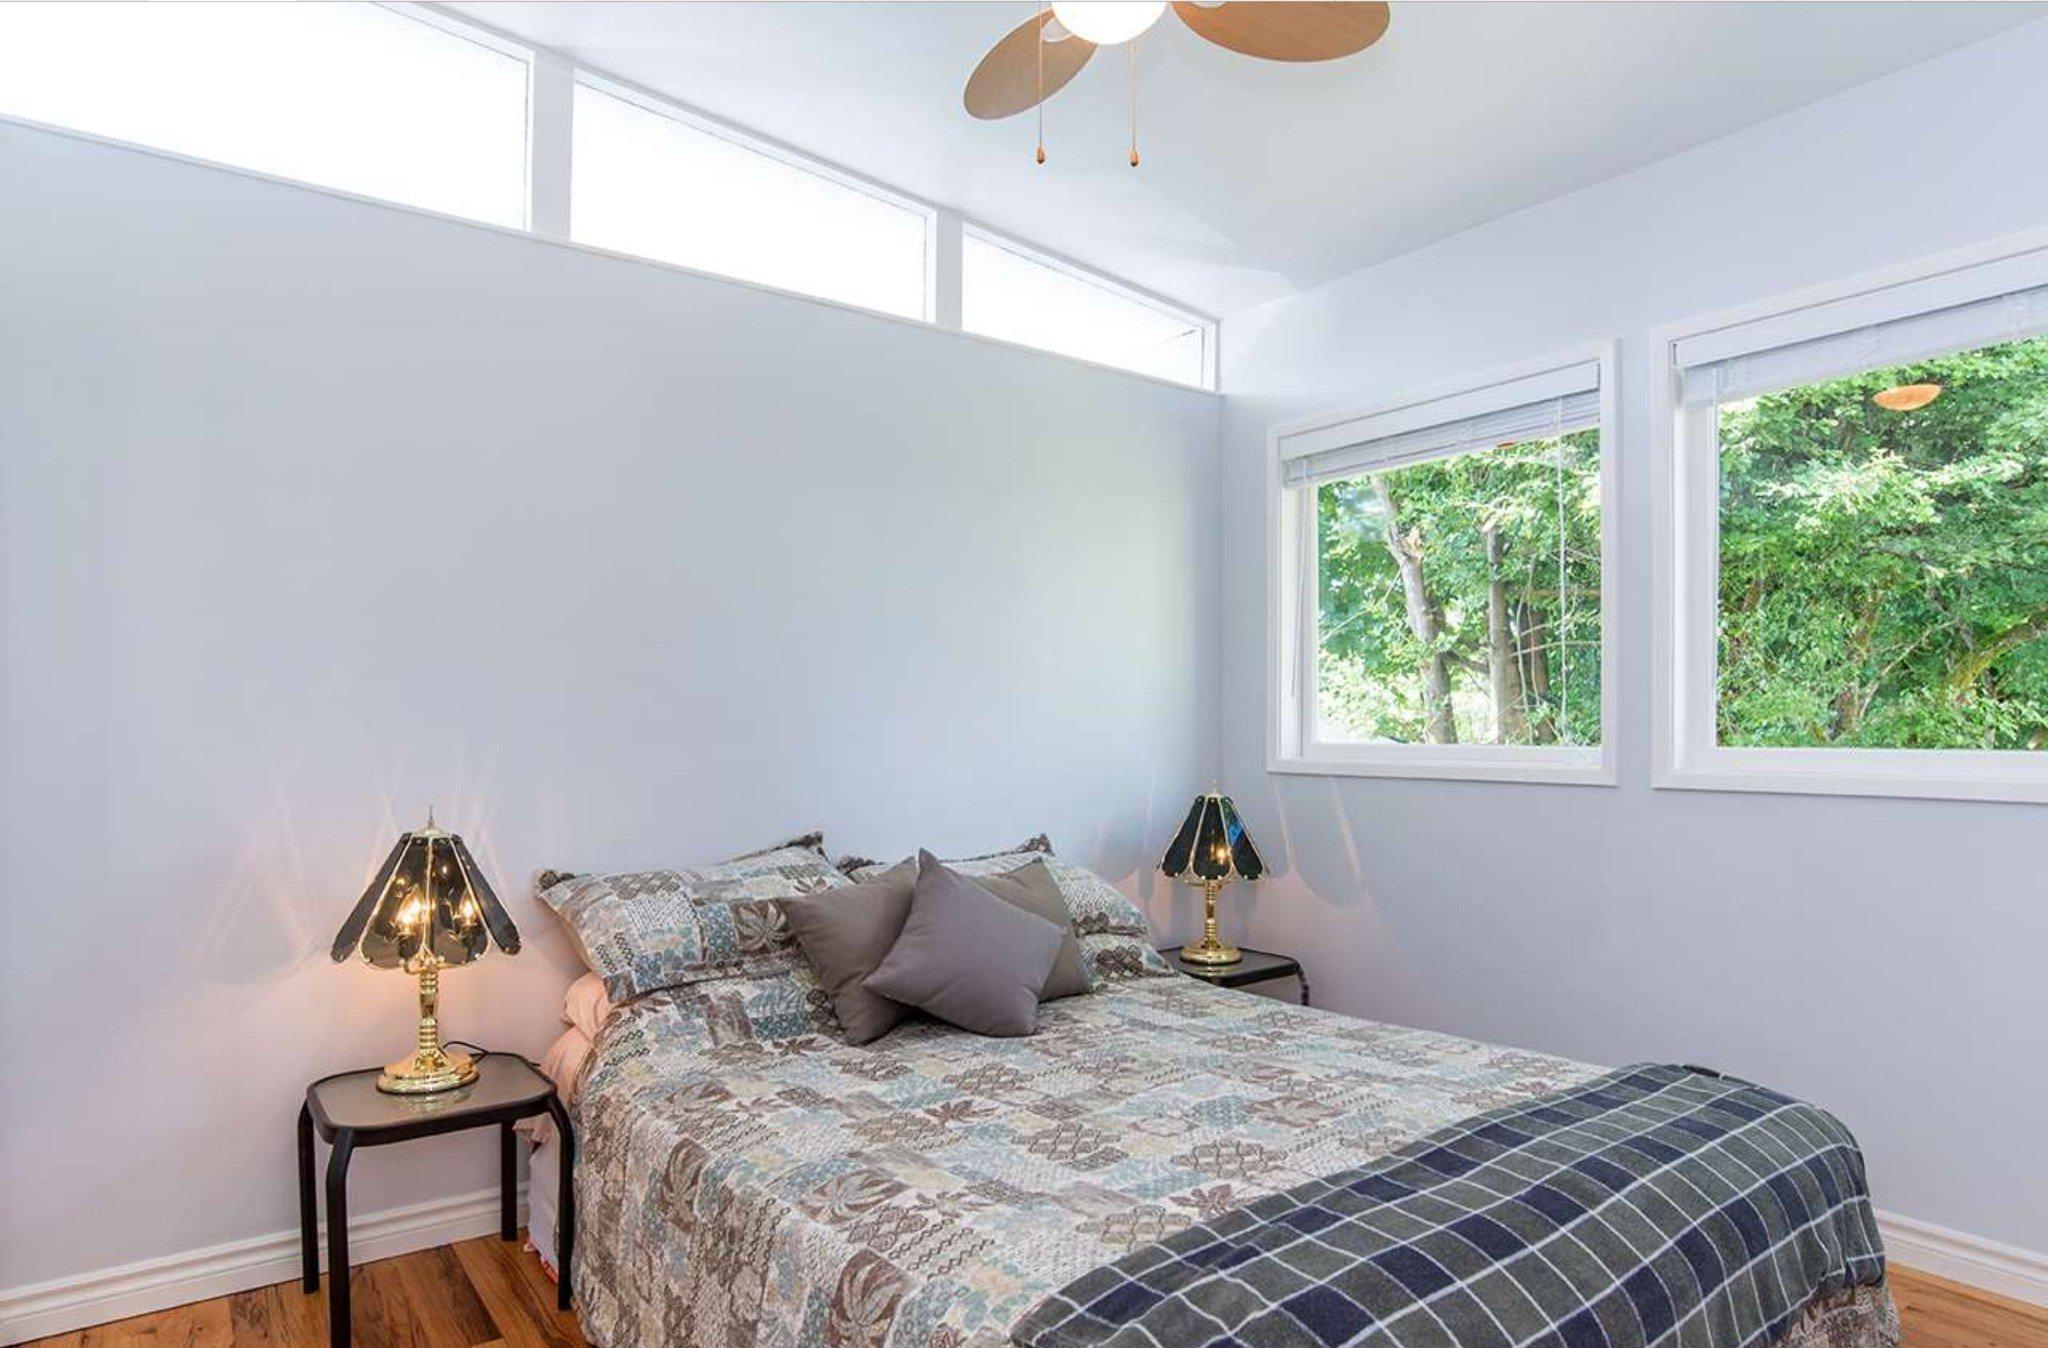 Photo 7: Photos: 10327 127A Street in Surrey: Cedar Hills House for sale : MLS®# R2178137